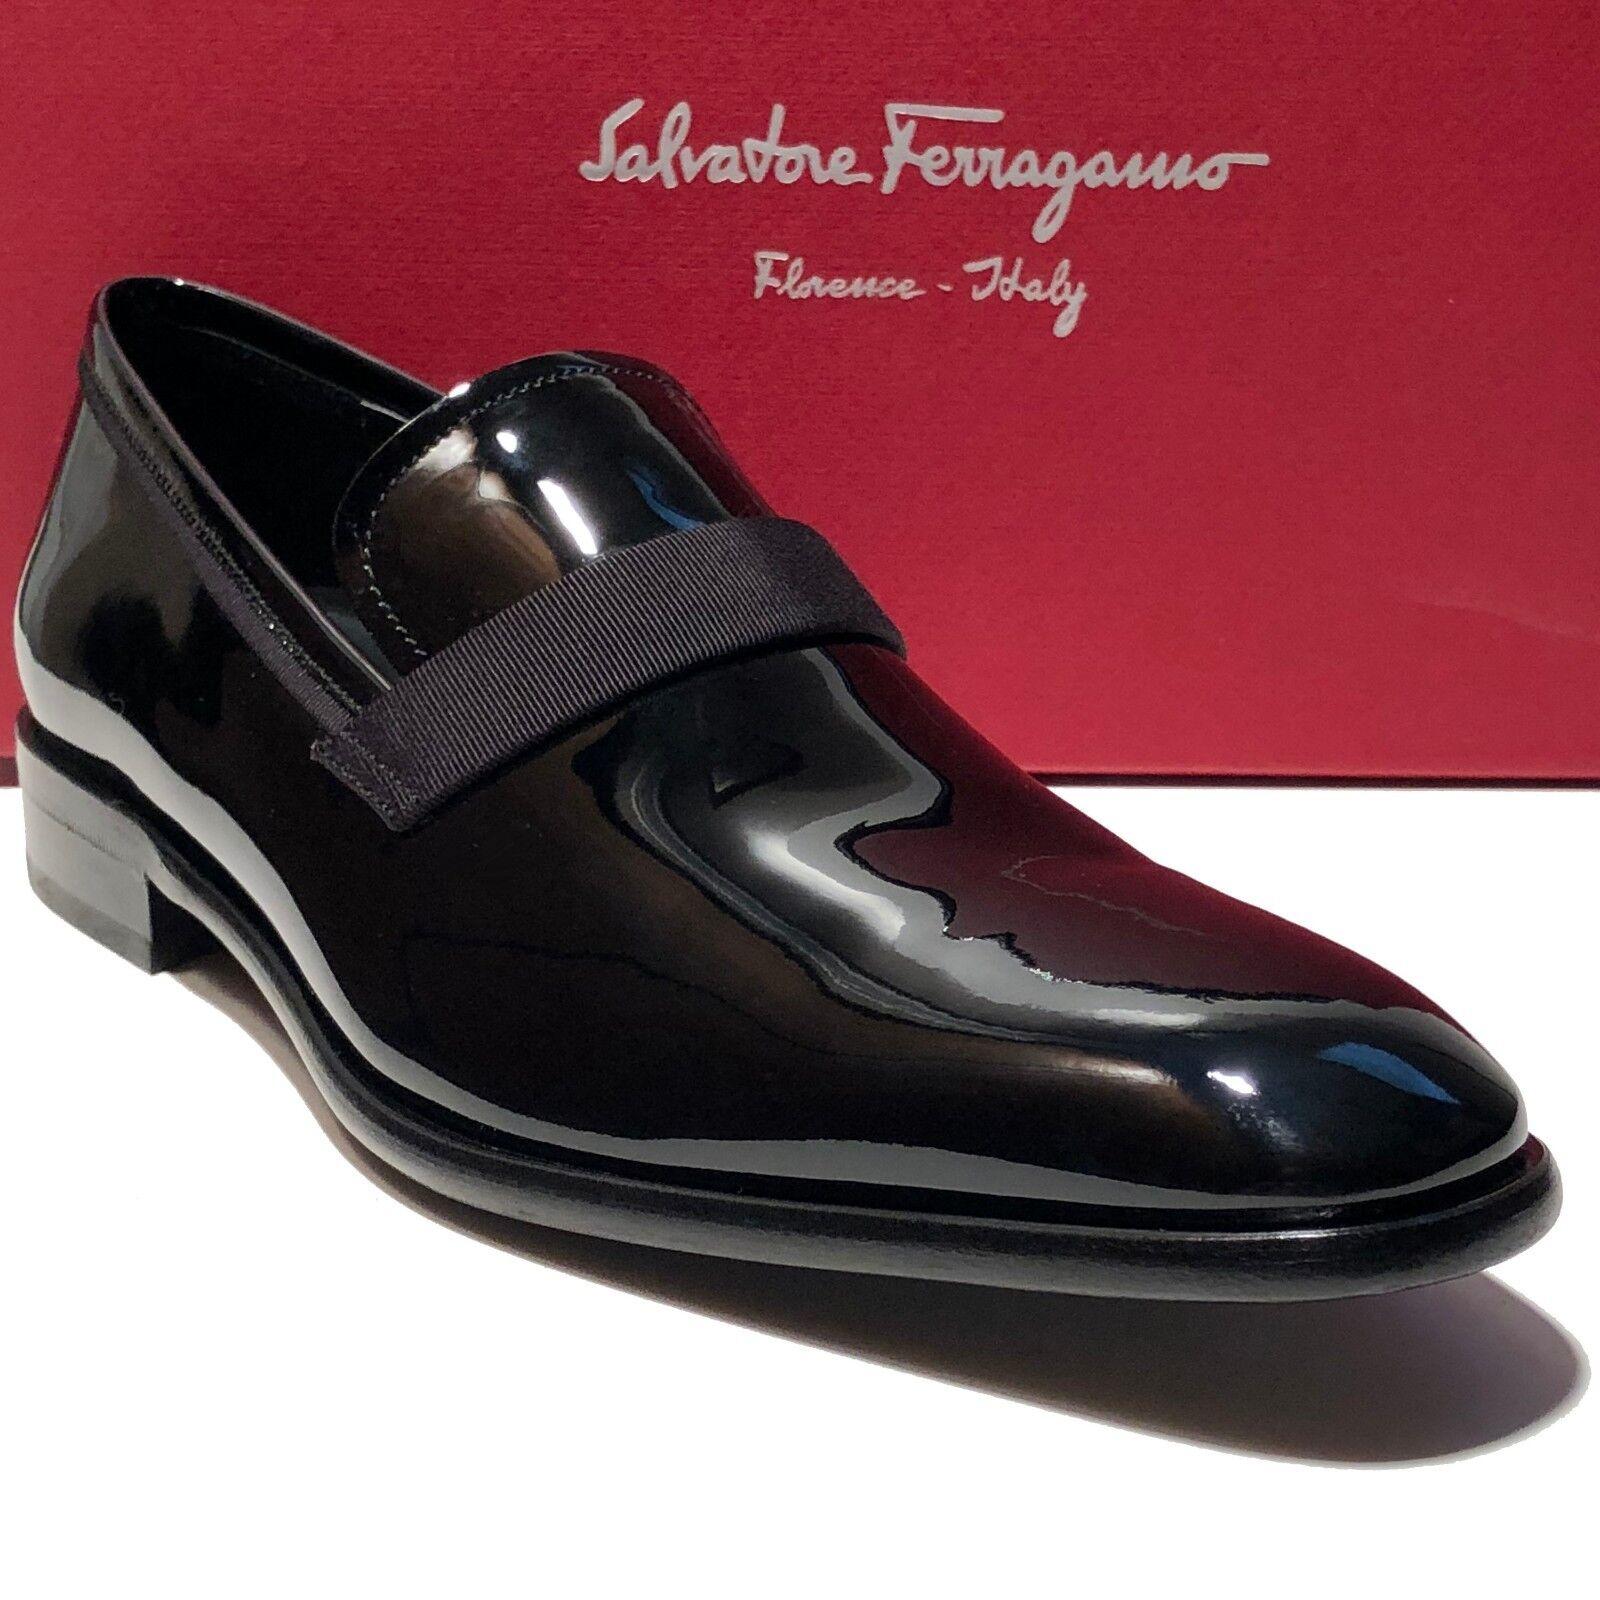 Ferragamo ANTOANE Patent Leather Formal 7 EE Men's Dress Loafers Tuxedo Wedding